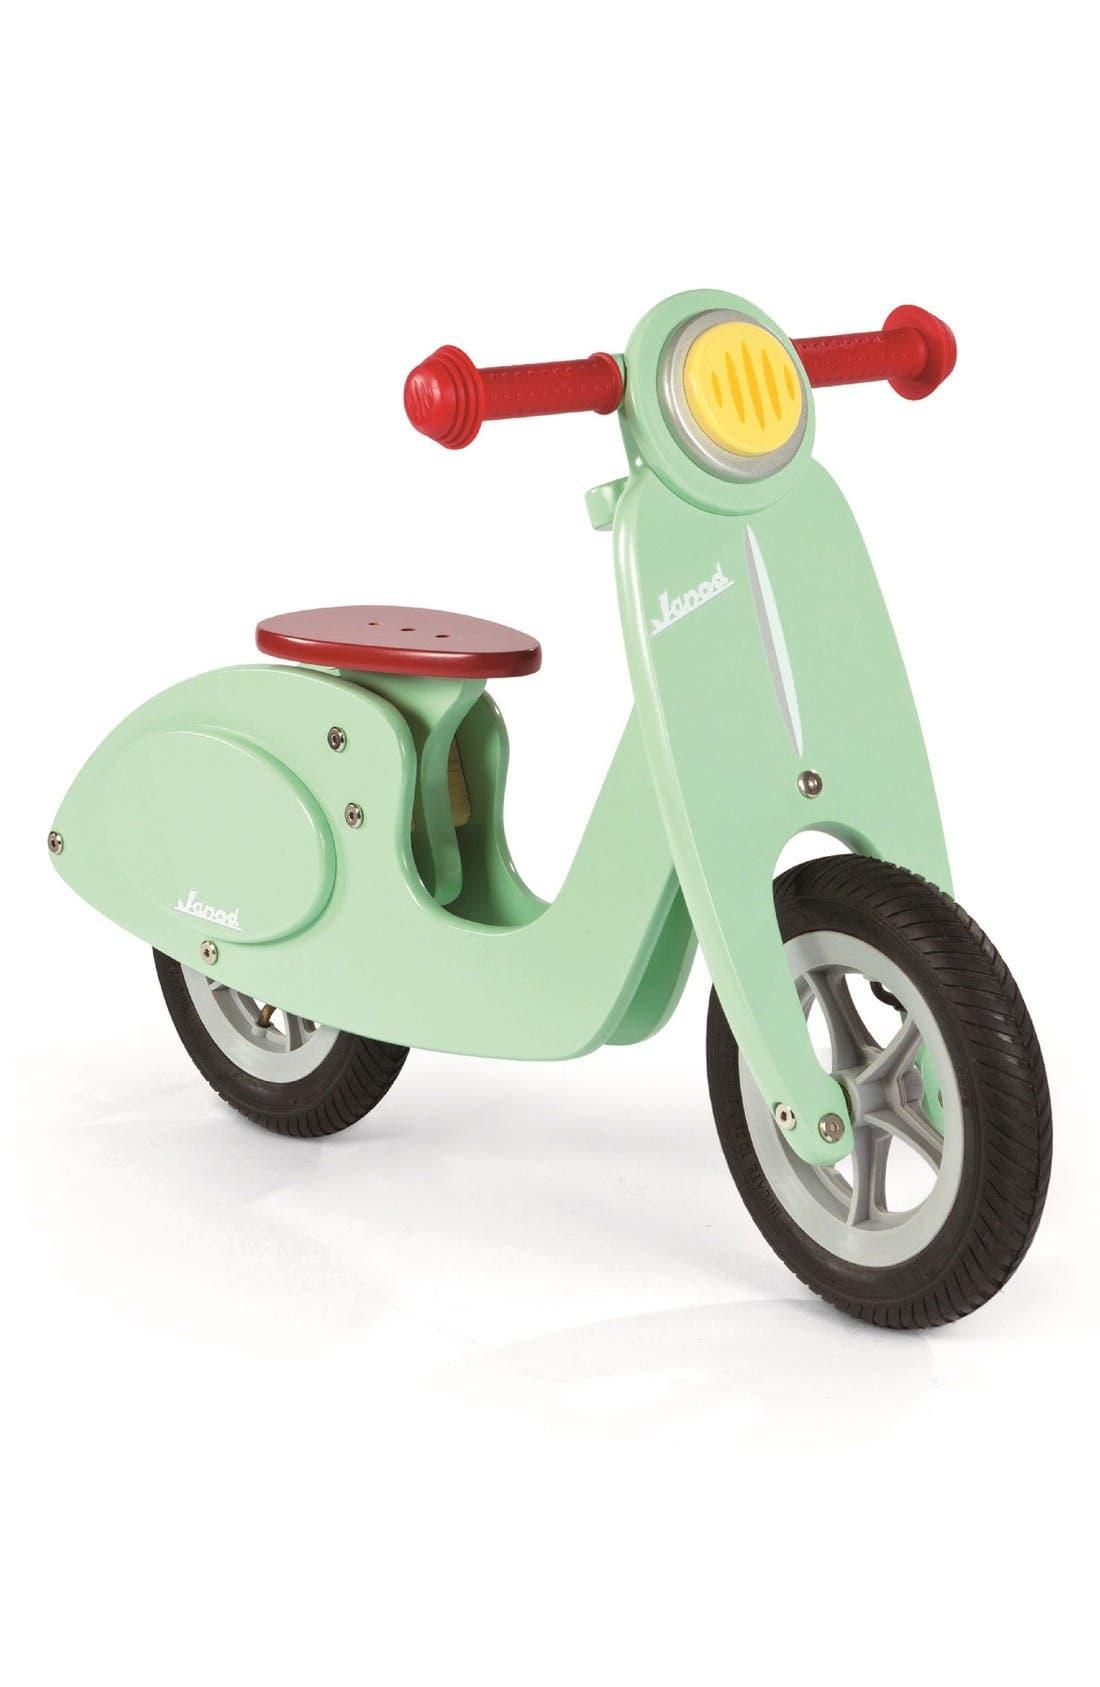 Alternate Image 1 Selected - Janod Mint Balance Scooter Bike